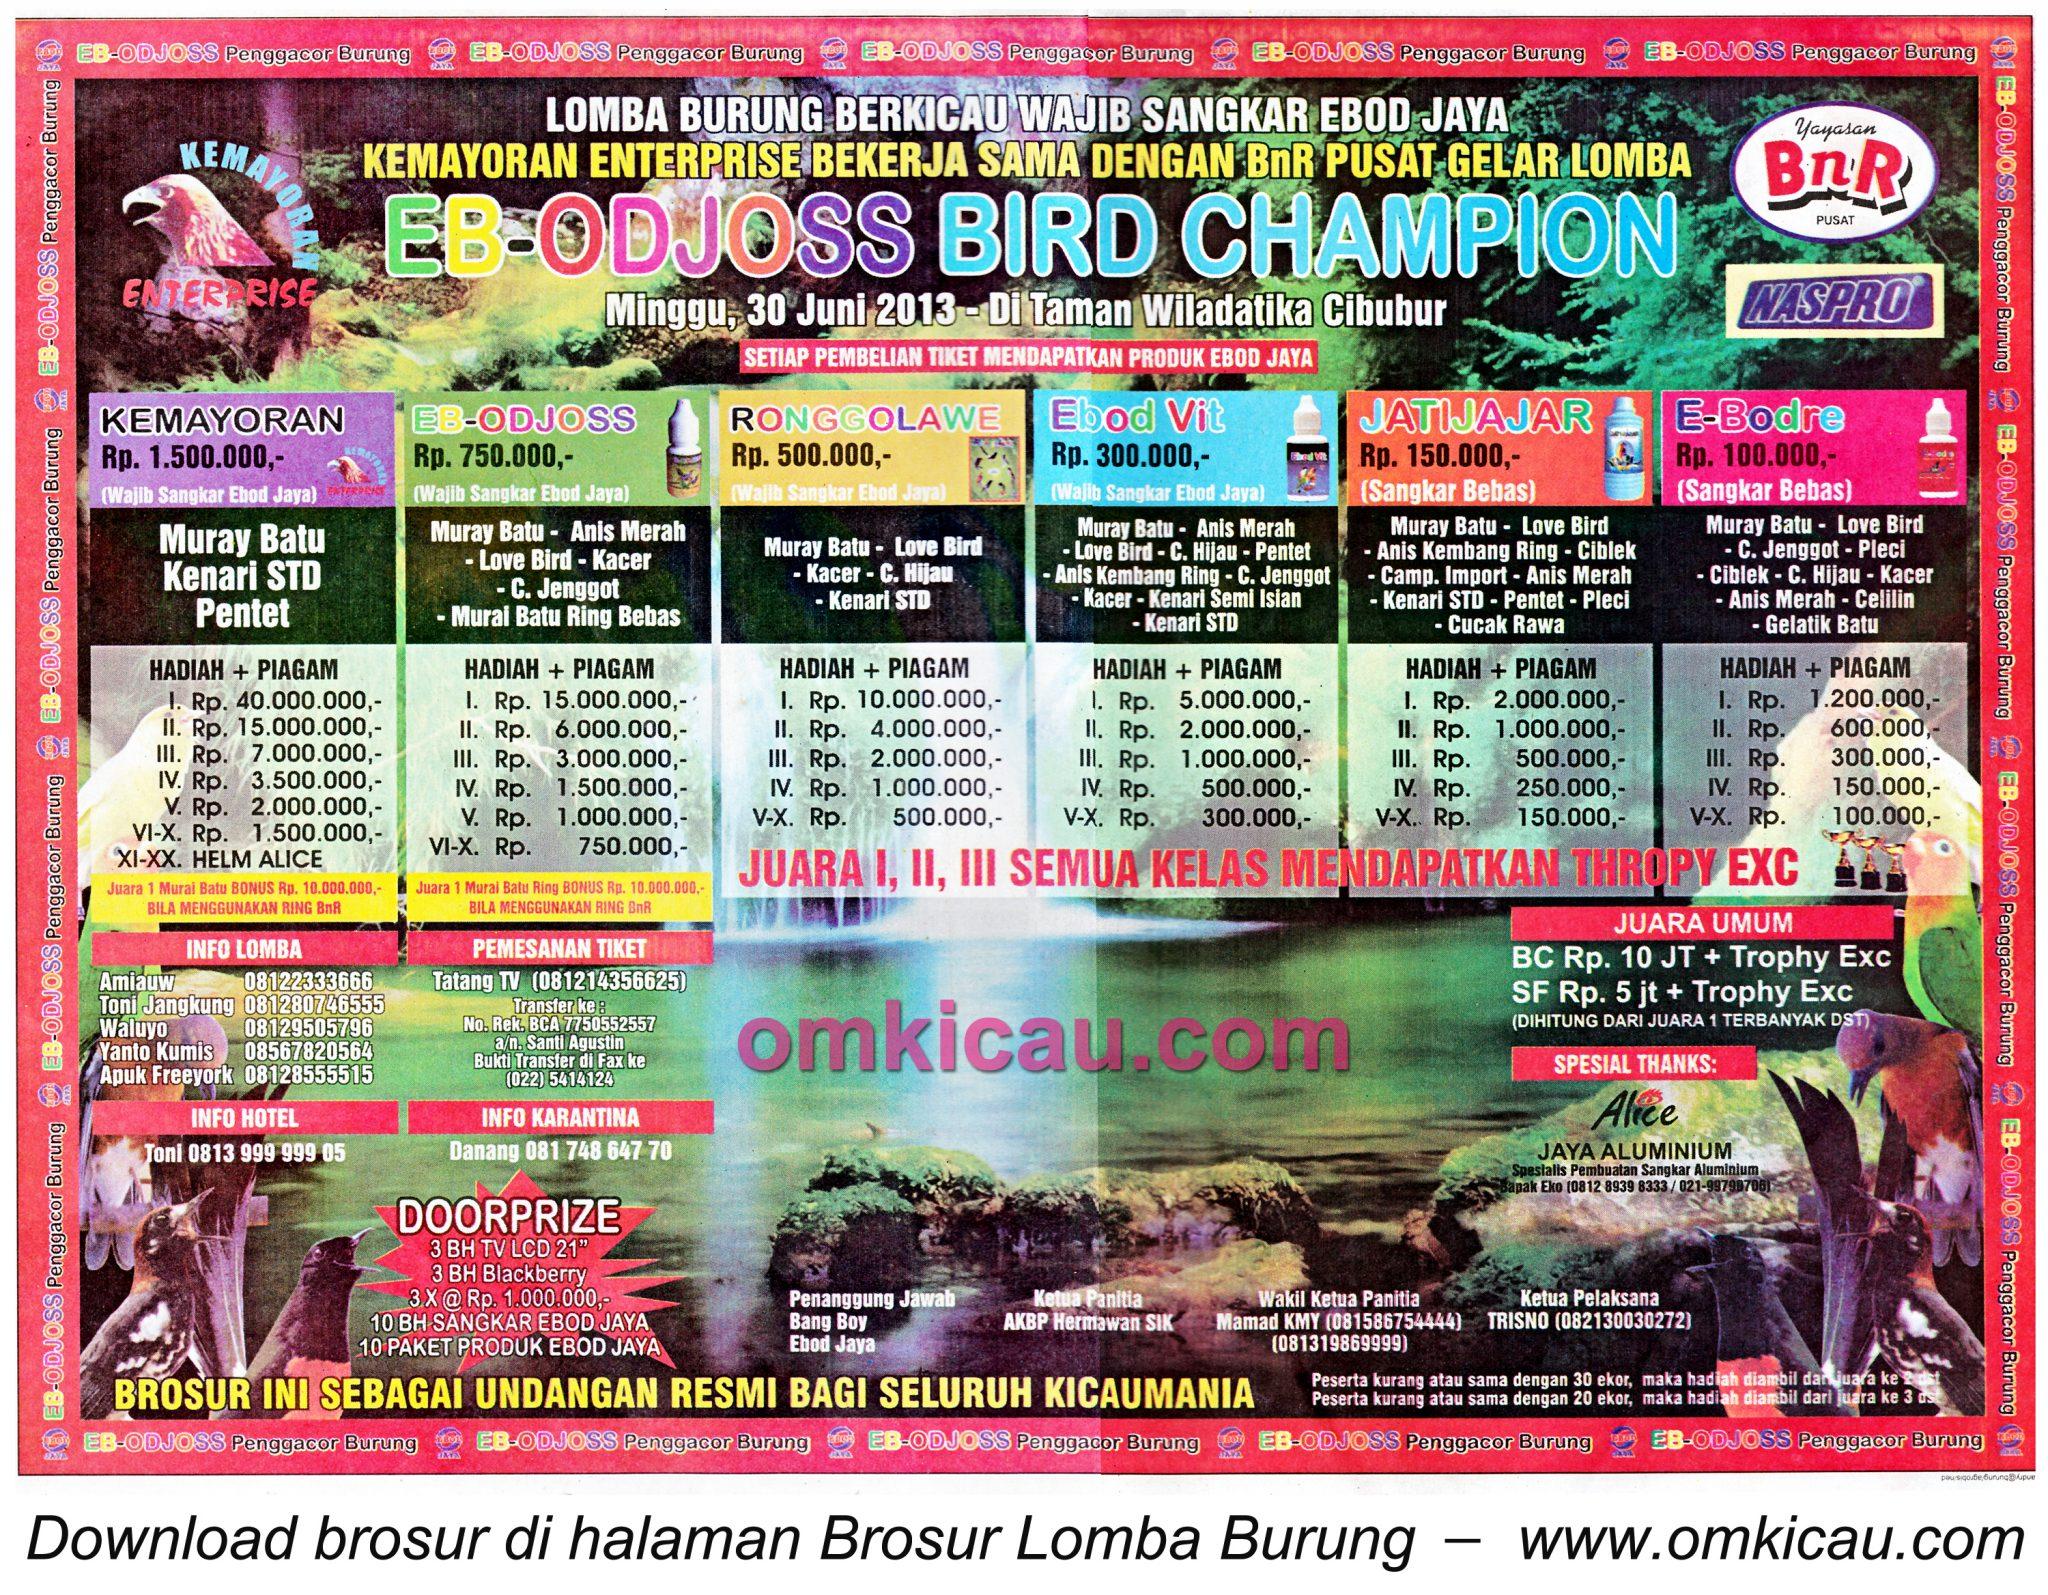 Brosur Lomba EB-Odjoss Bird Champion - Cibubur - 30 Juni 2013